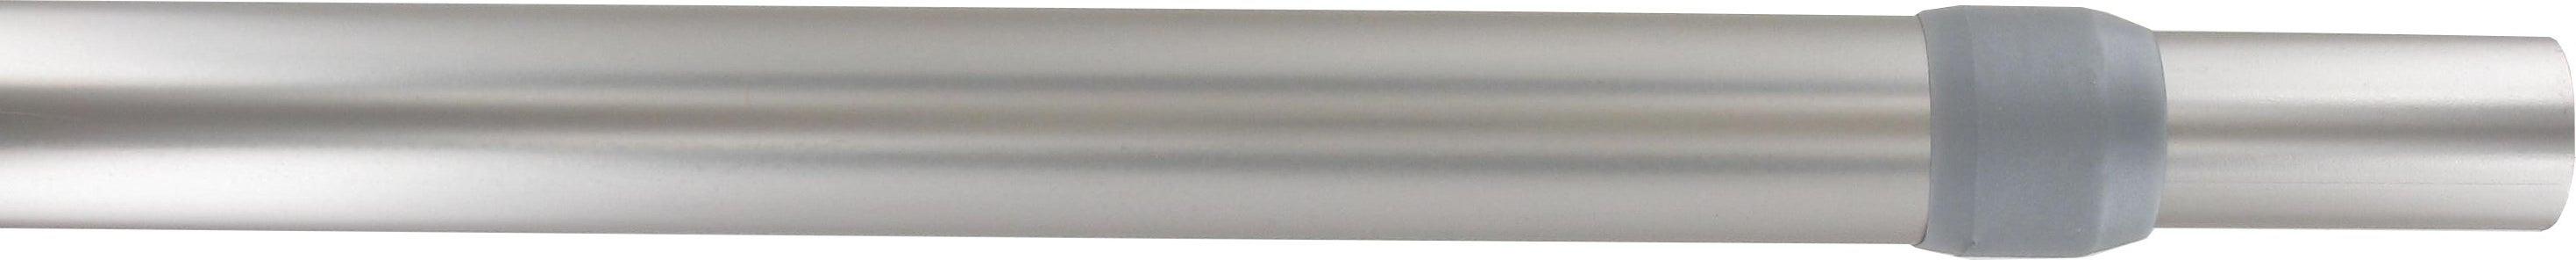 Tringle A Rideau Extensible Chrome Satine Diam 25 Mm De 100 A 180 Cm Ib Leroy Merlin